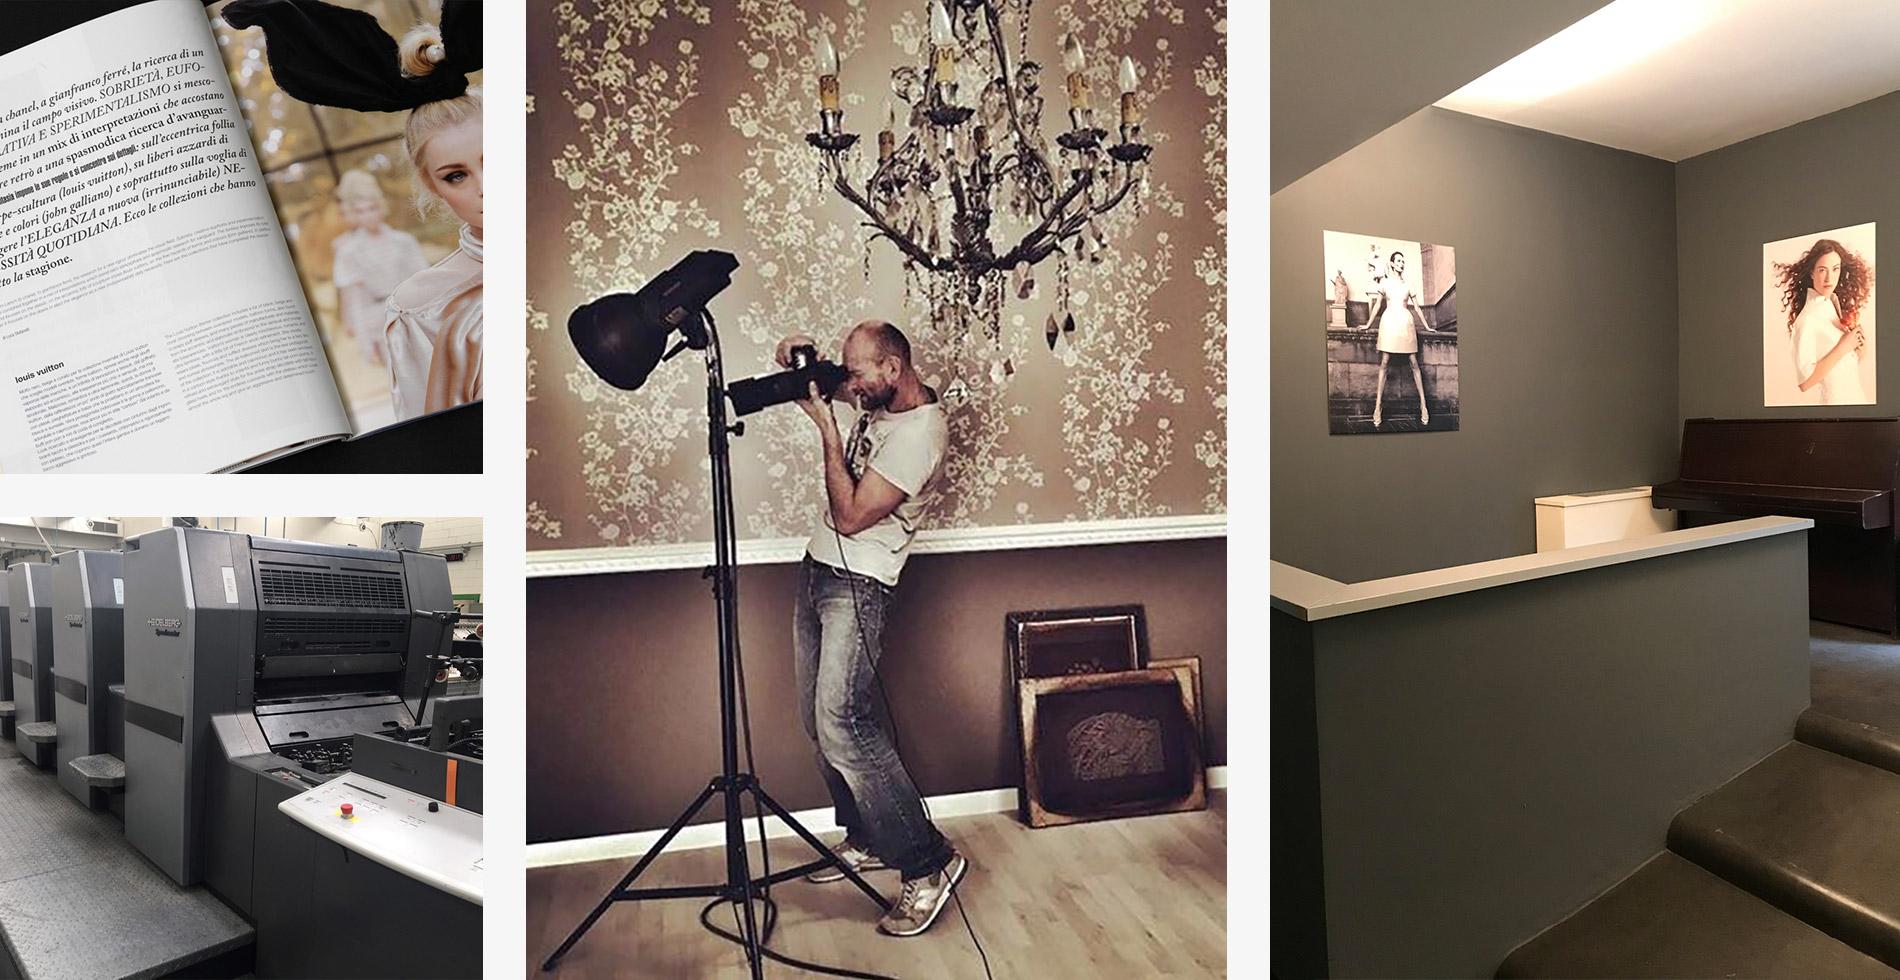 sala-stampa-studio-fotografico-stampa-bergamo-modonesi-2